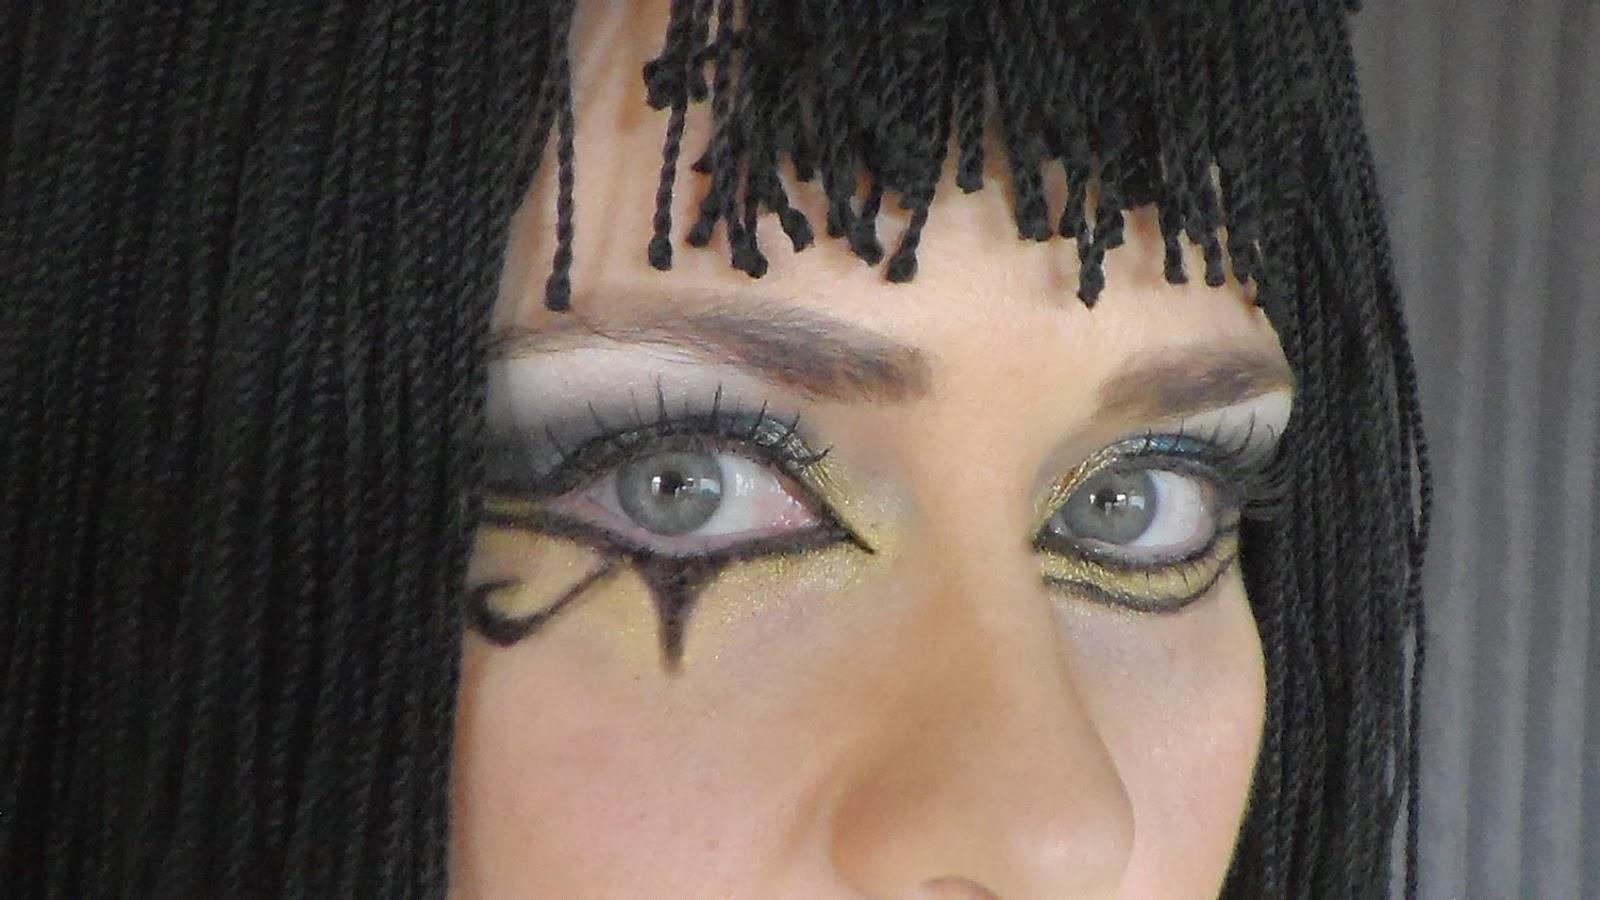 amarillo, dorado, azul, negro, maquillaje, caracterización, katy perry